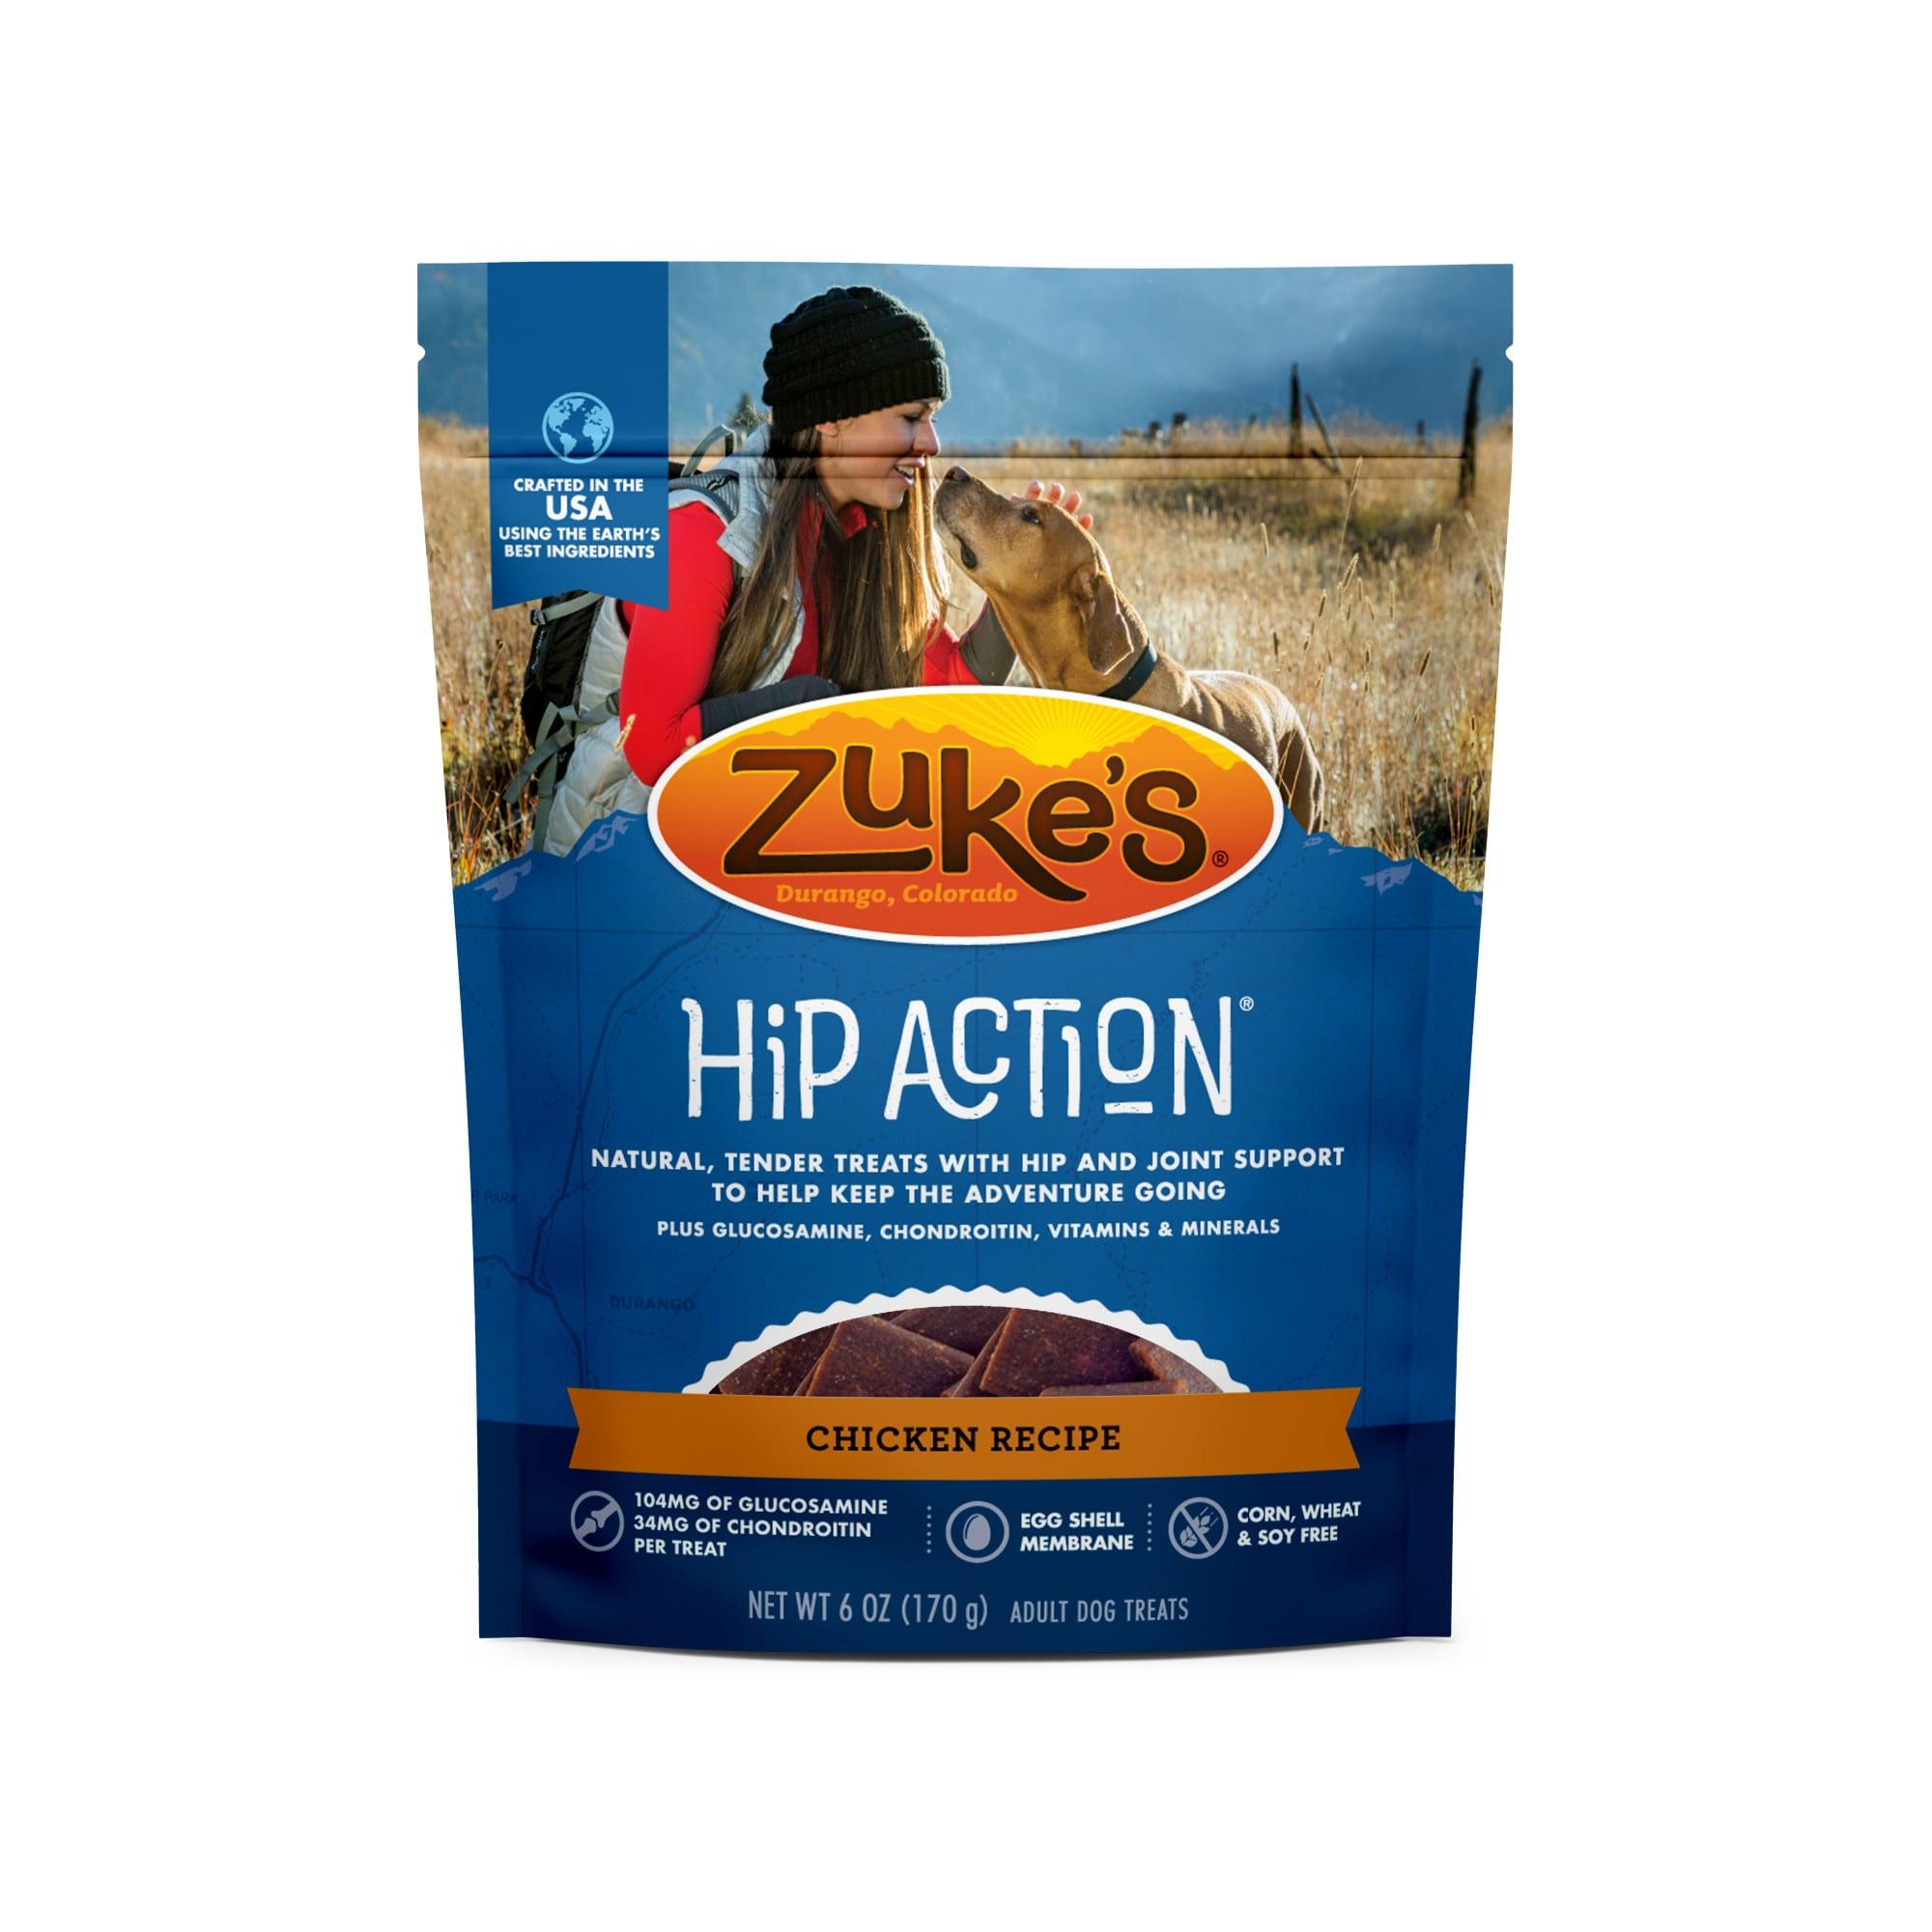 Image of Zuke's Hip Action Roasted Chicken Recipe Dog Treats